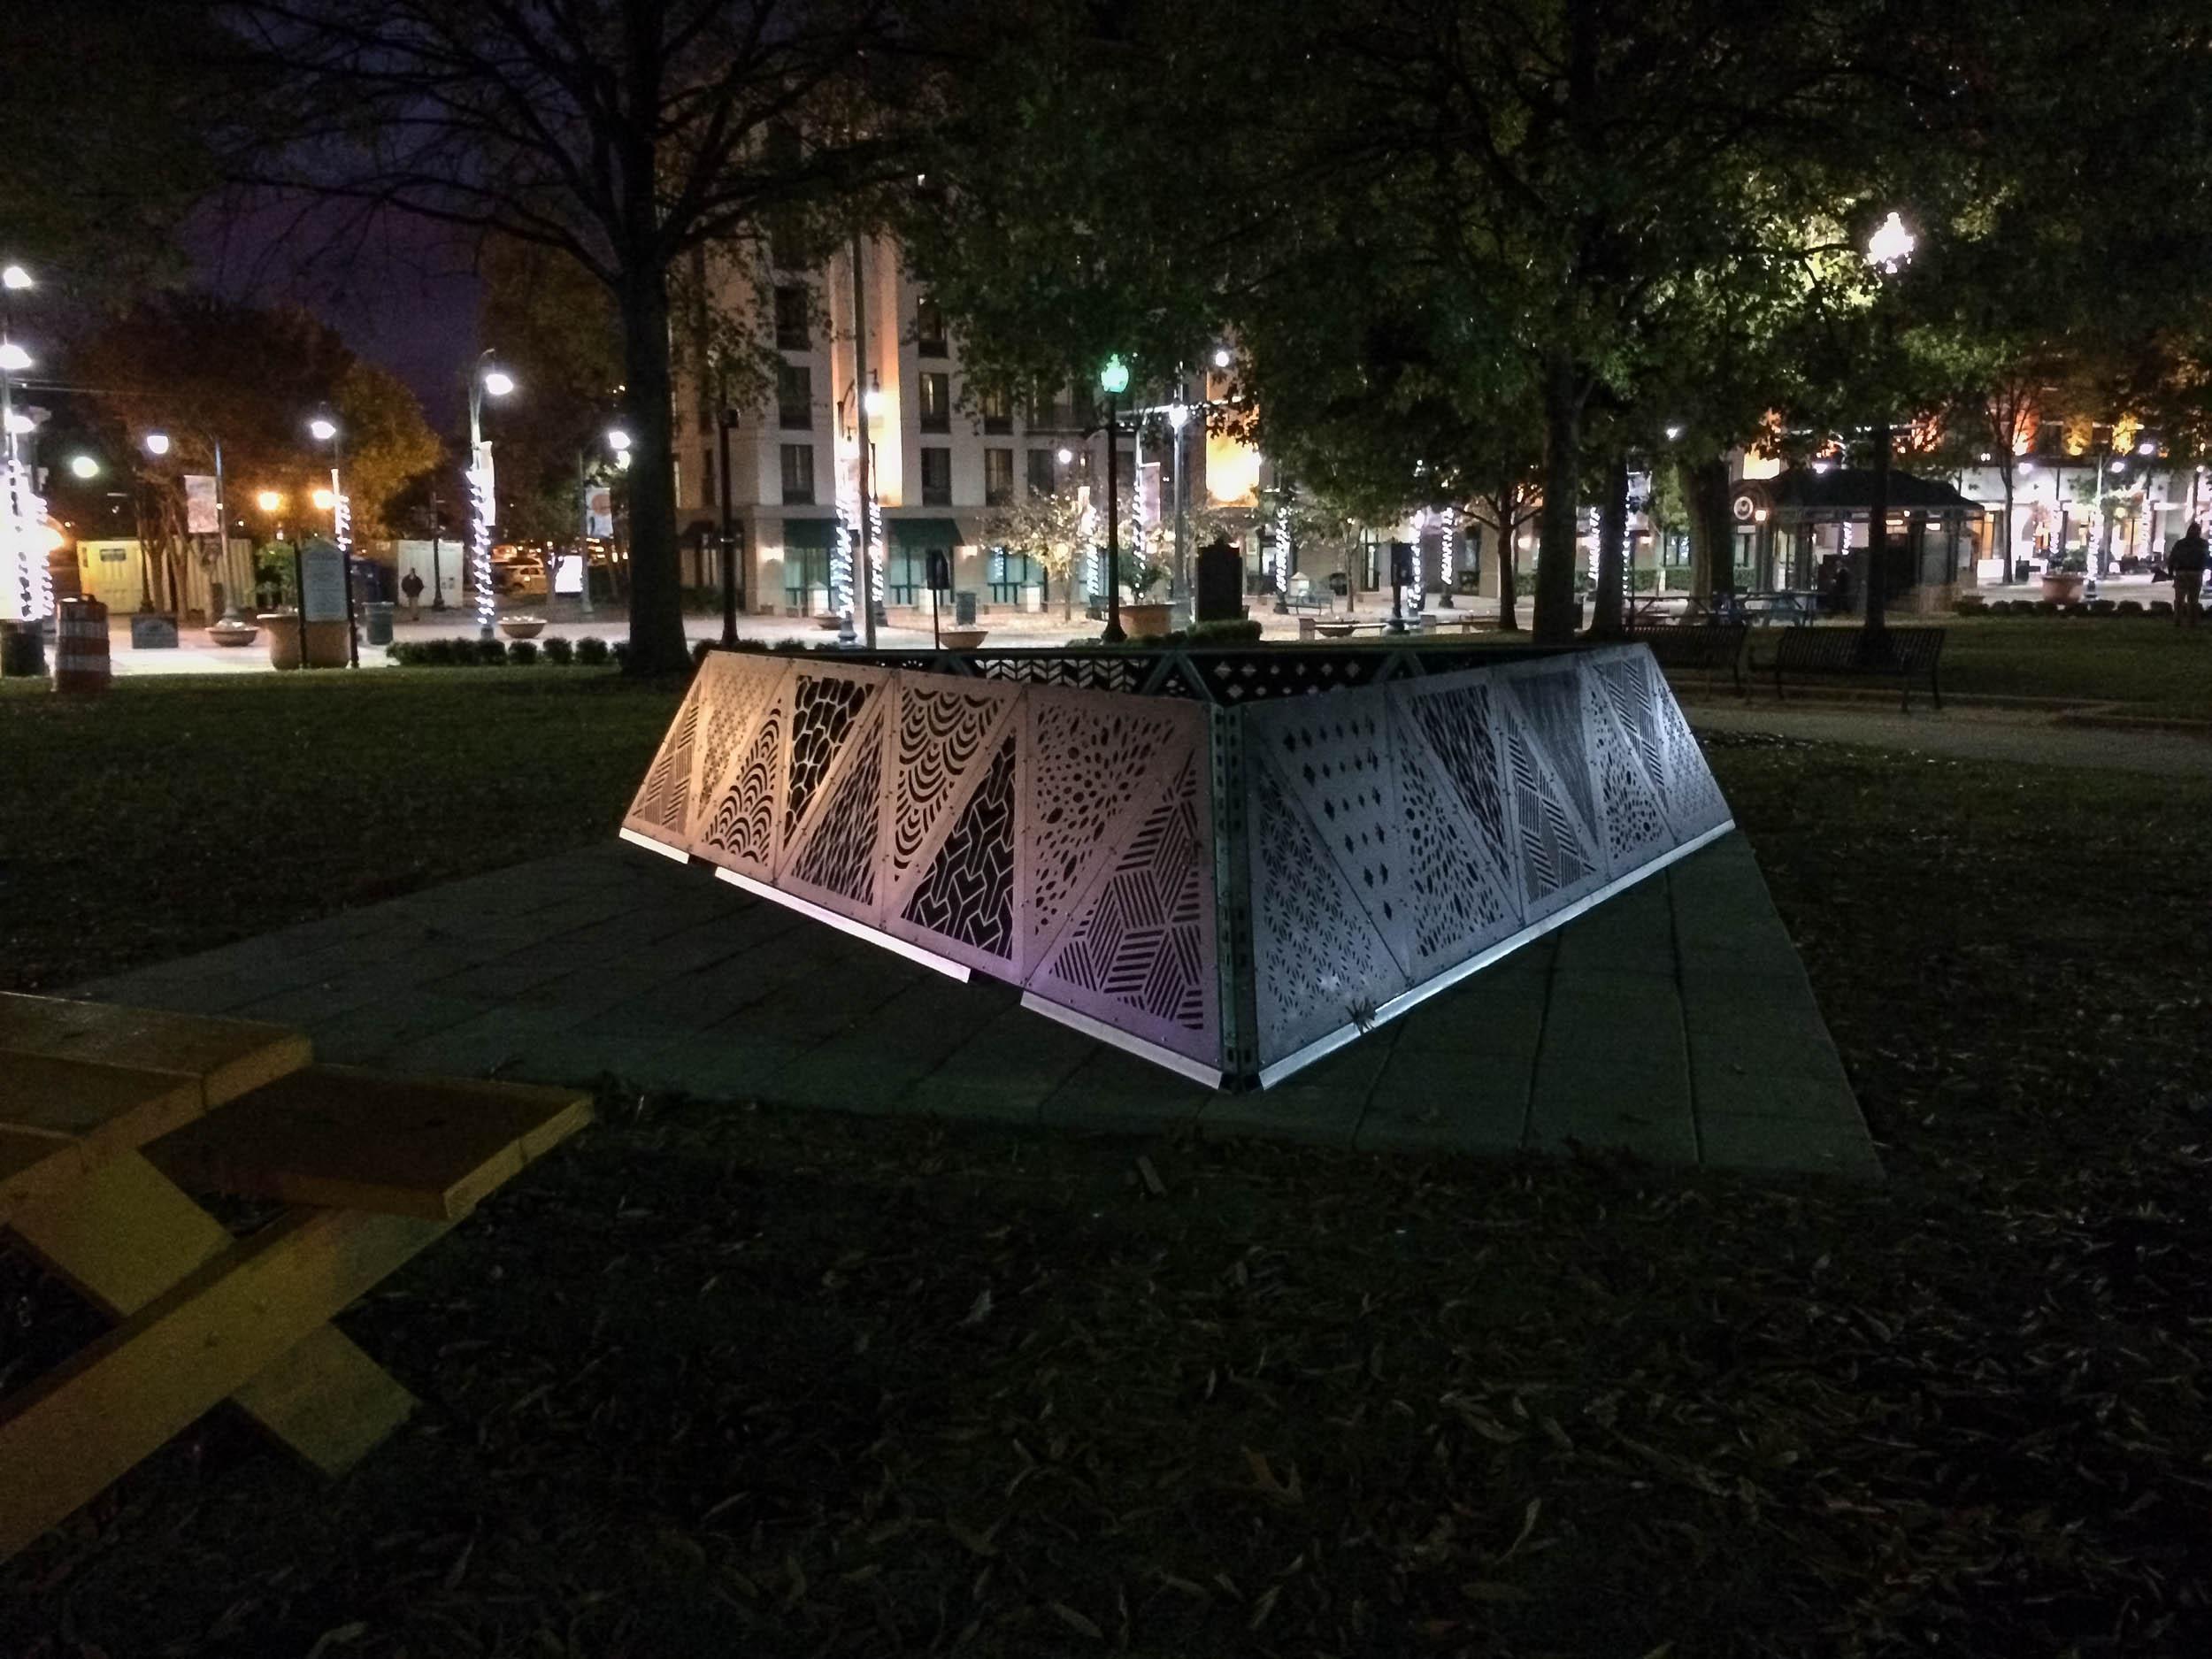 MOD 1 Tetrahedron Downtown Installation 0006.jpg